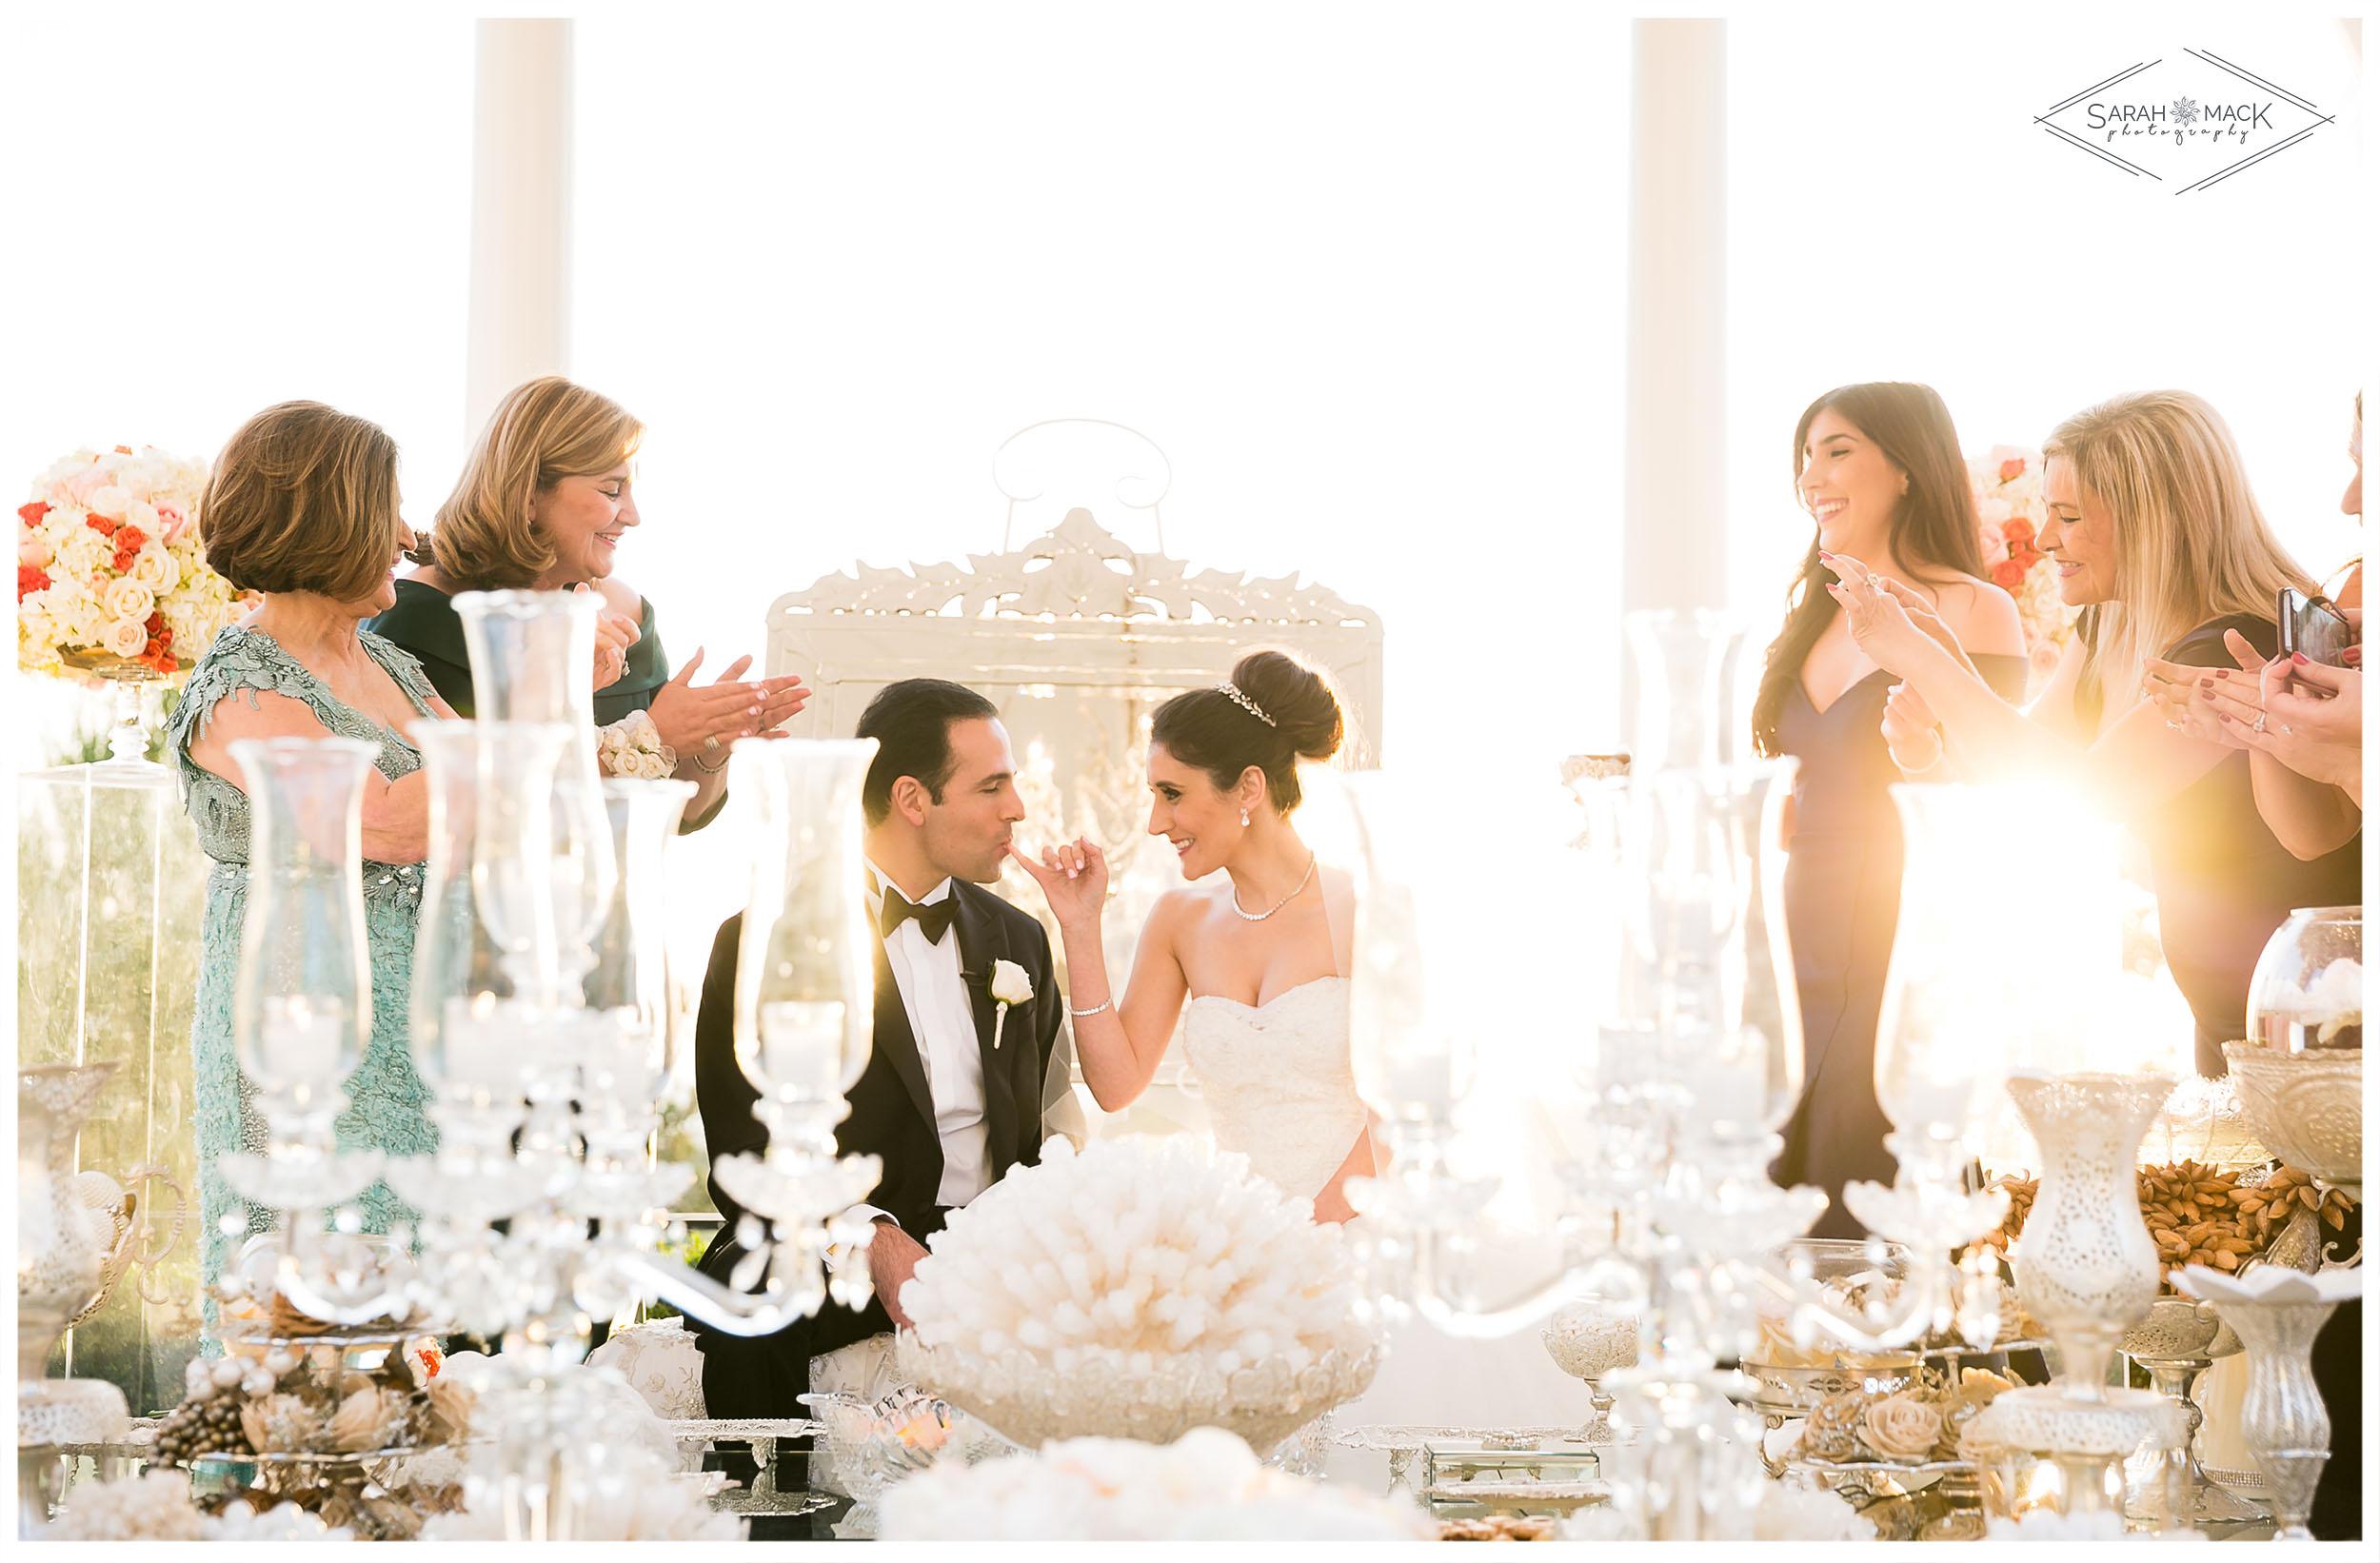 NJ-Newport-Beach-Marriott-Persian-Wedding-30.jpg